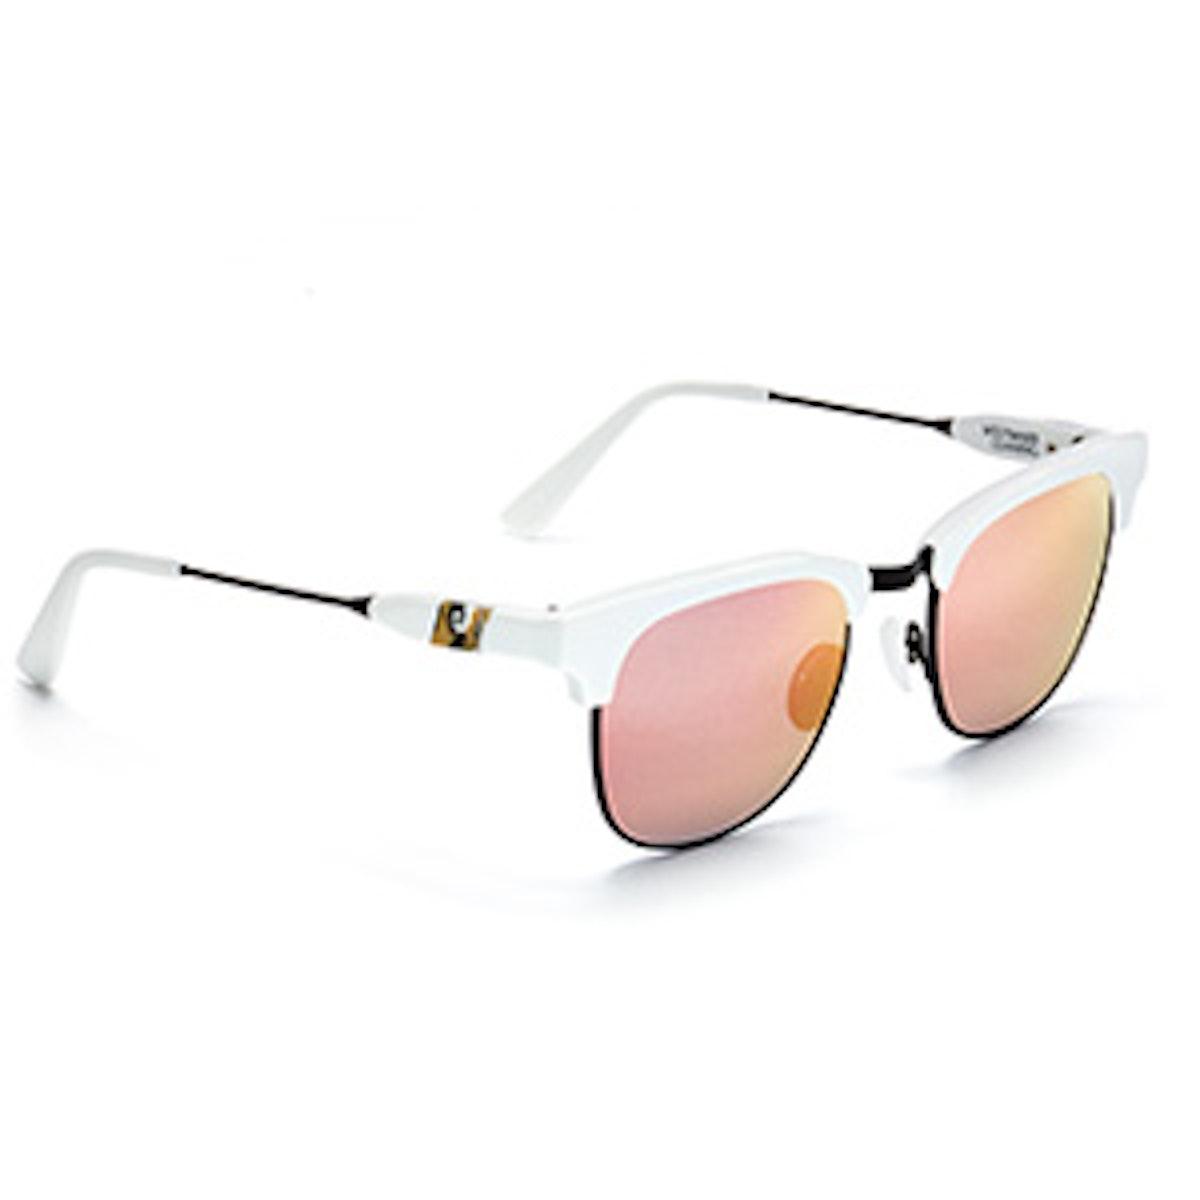 Vanguard 13 Sunglasses